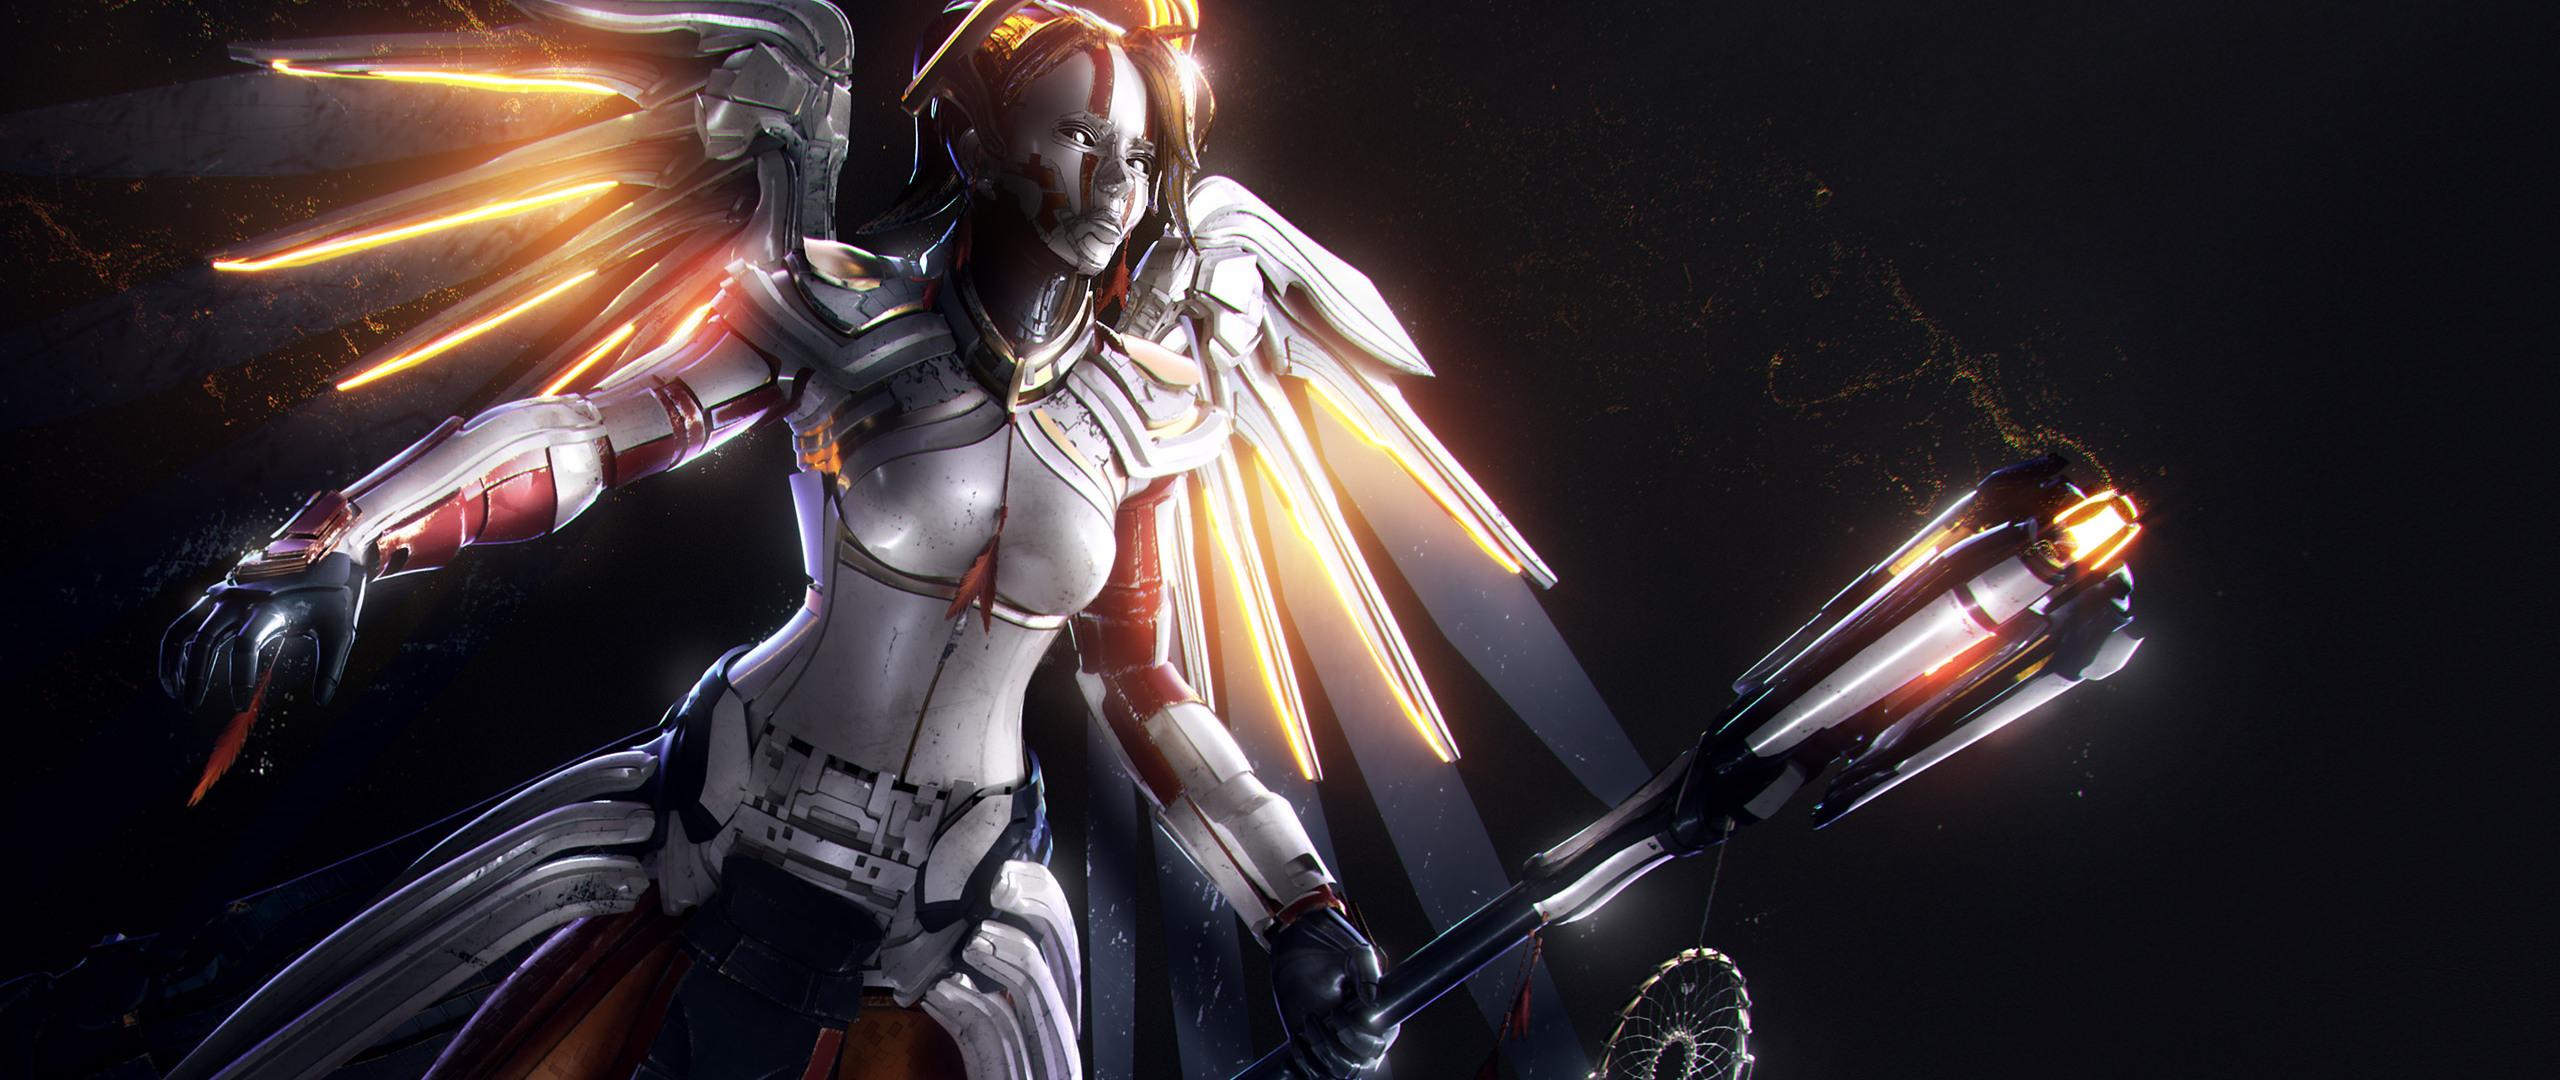 2560x1080 Final Fantasy Xv Artwork 2560x1080 Resolution Hd: 2560x1080 Mercy Overwatch Artwork Hd 2560x1080 Resolution